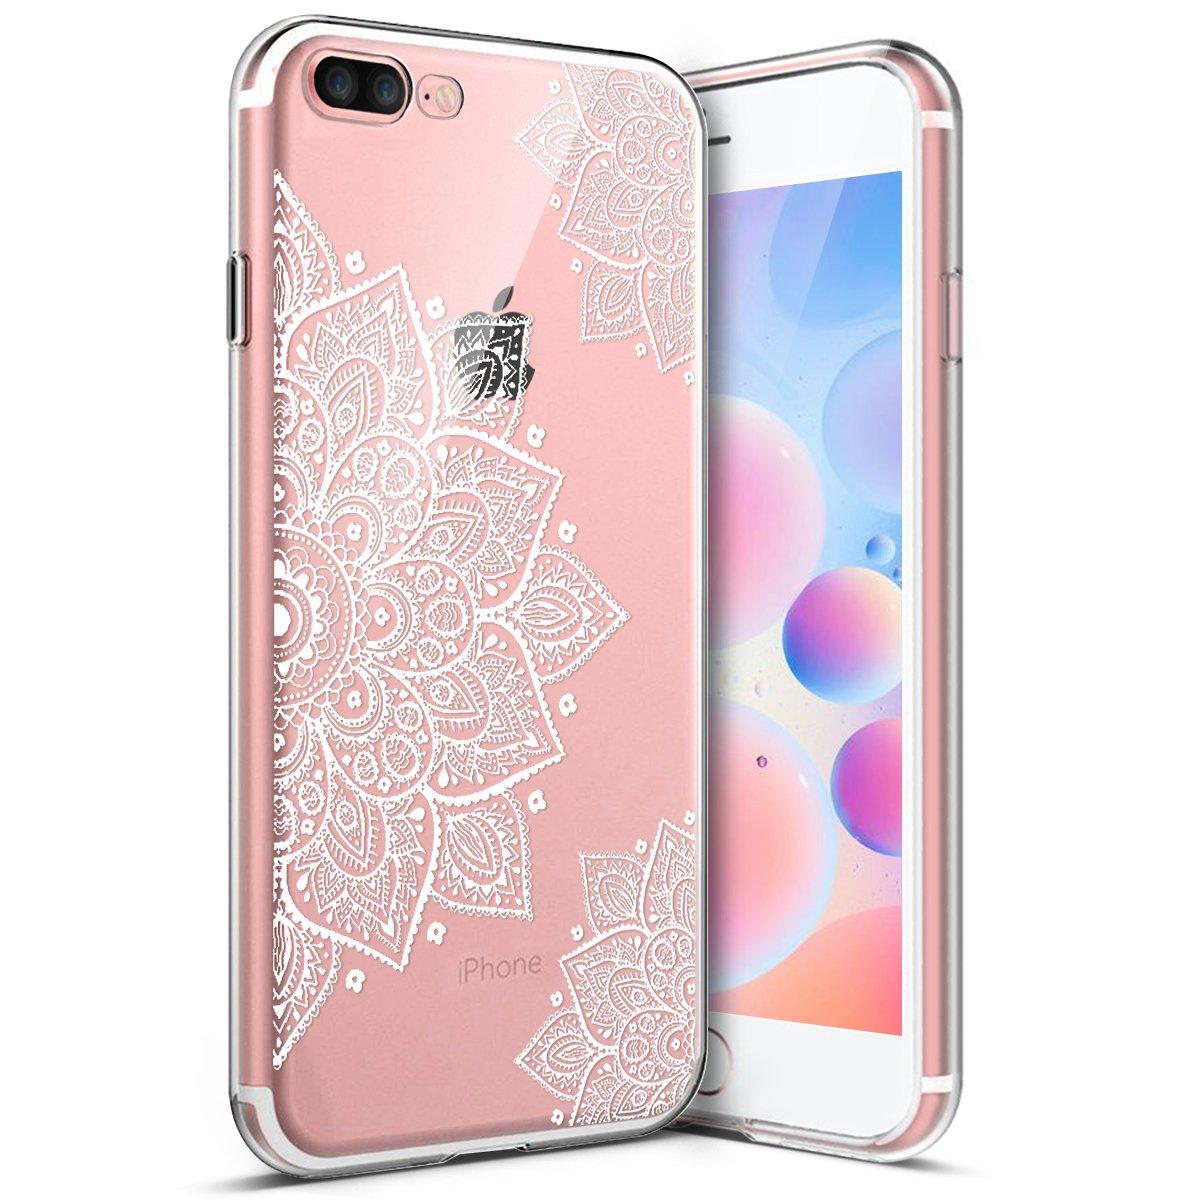 surakey iphone 8 case